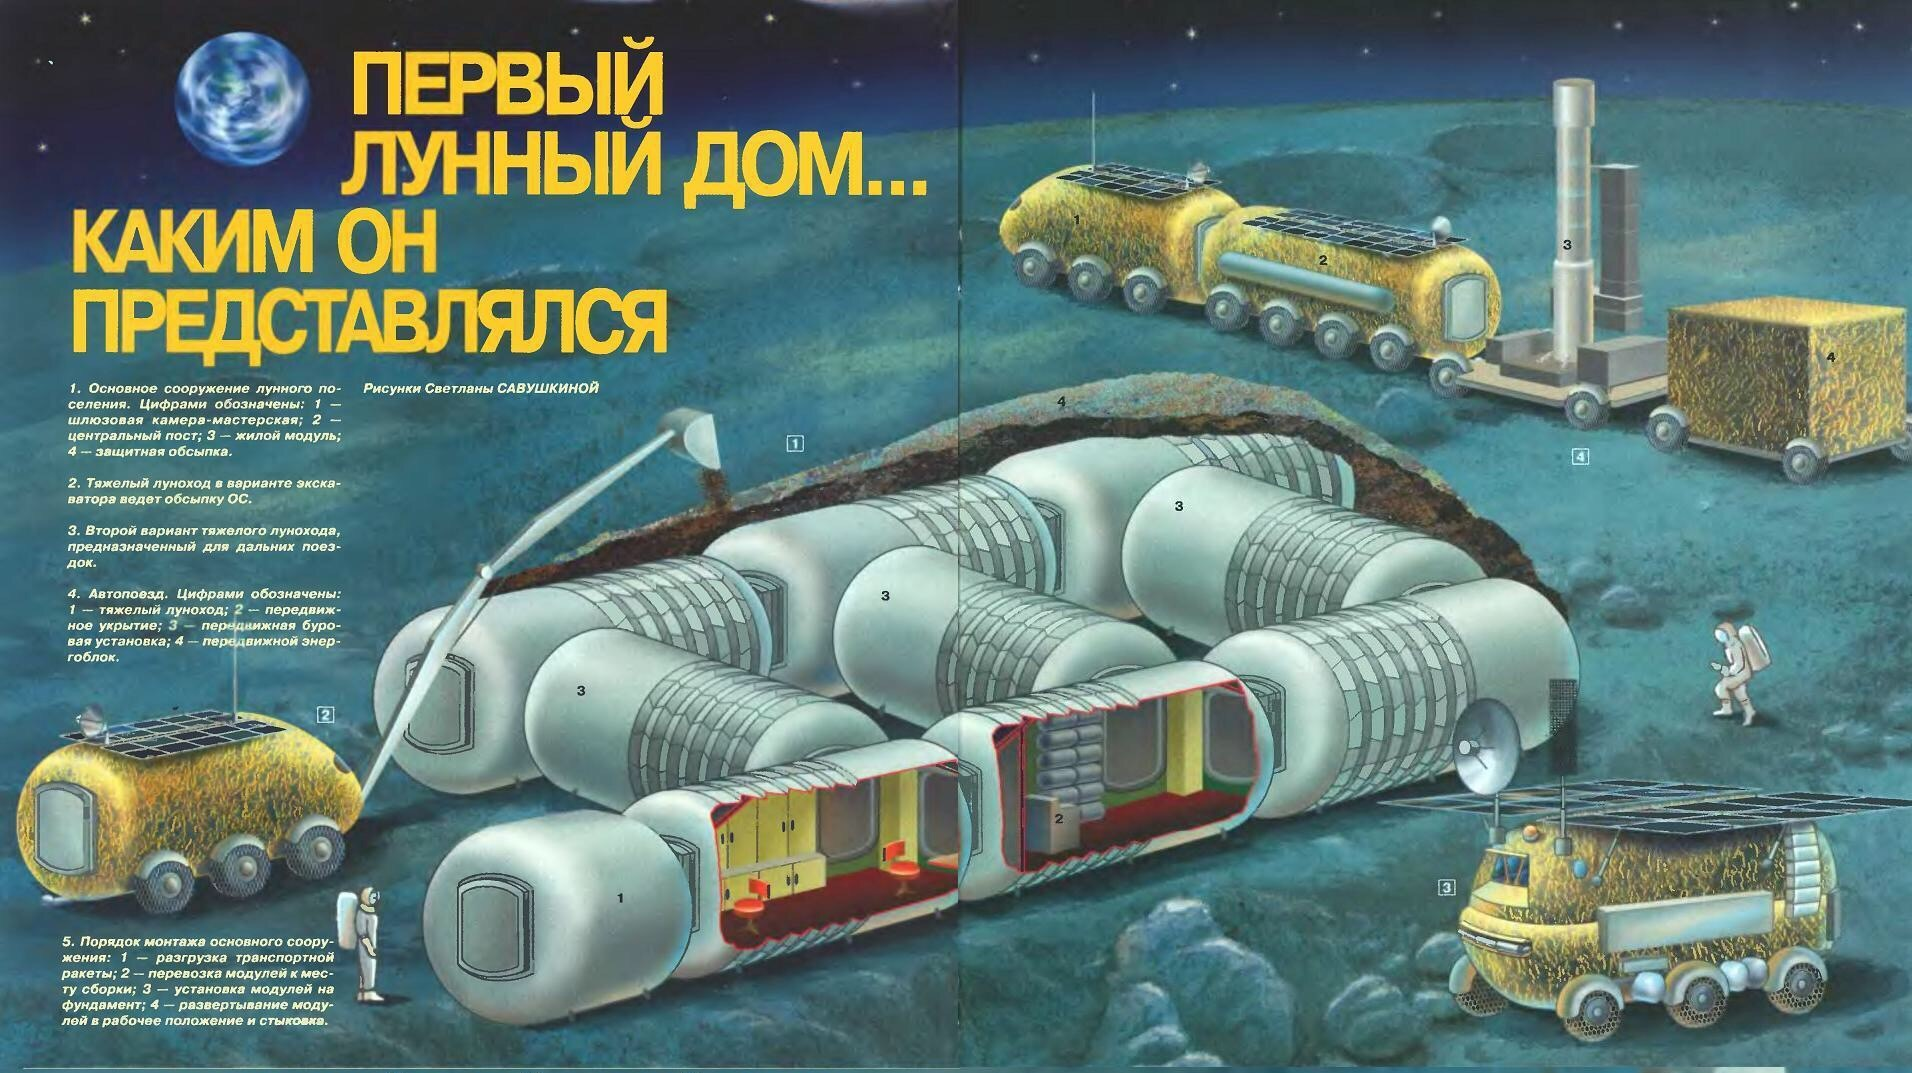 https://cs11.pikabu.ru/post_img/big/2020/05/23/3/1590205777171379293.jpg